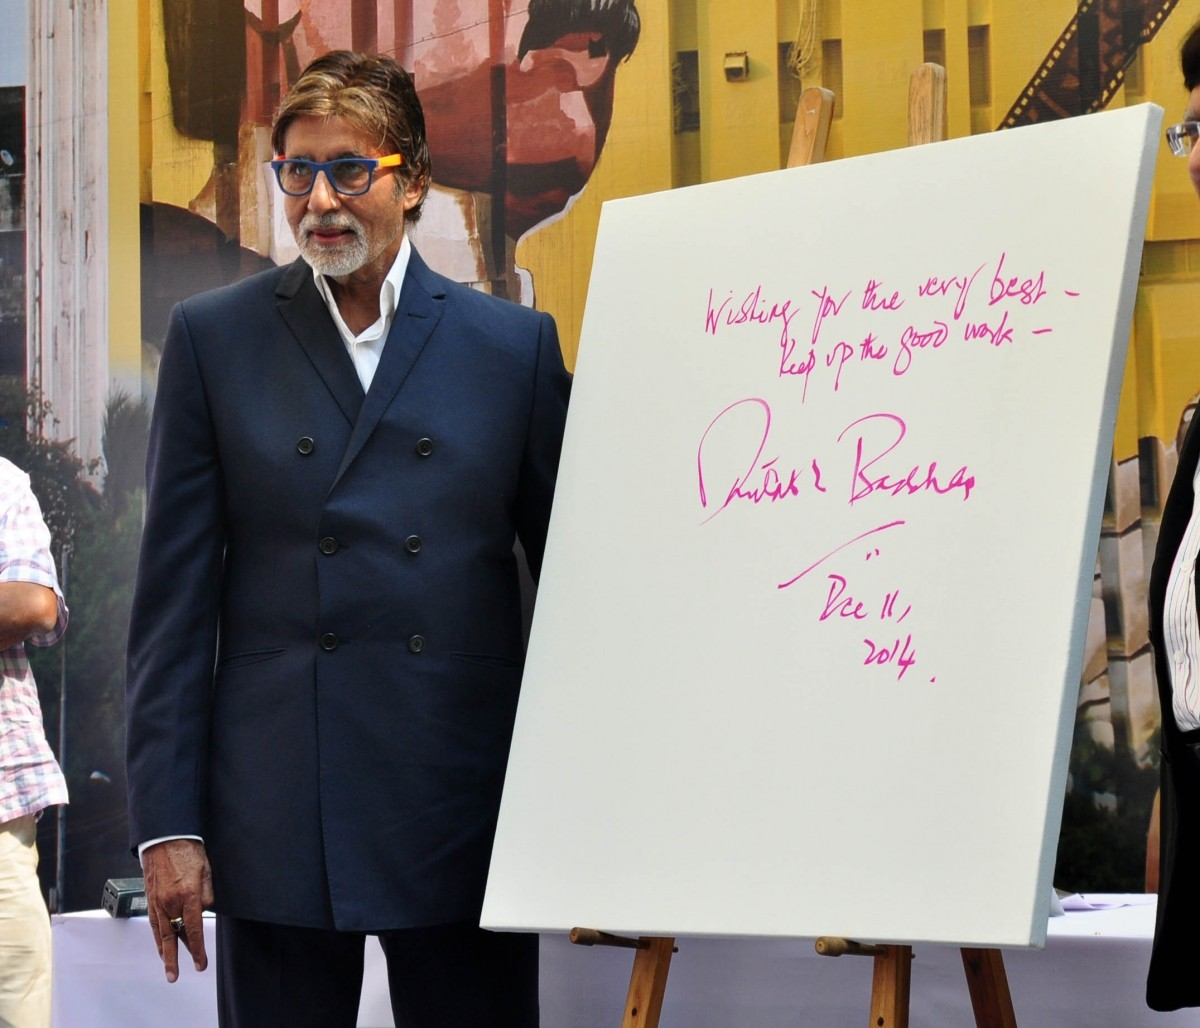 Amitabh Bachchan at the inaugural event of Gigantic Mural of  'Dada Saheb Phalke'